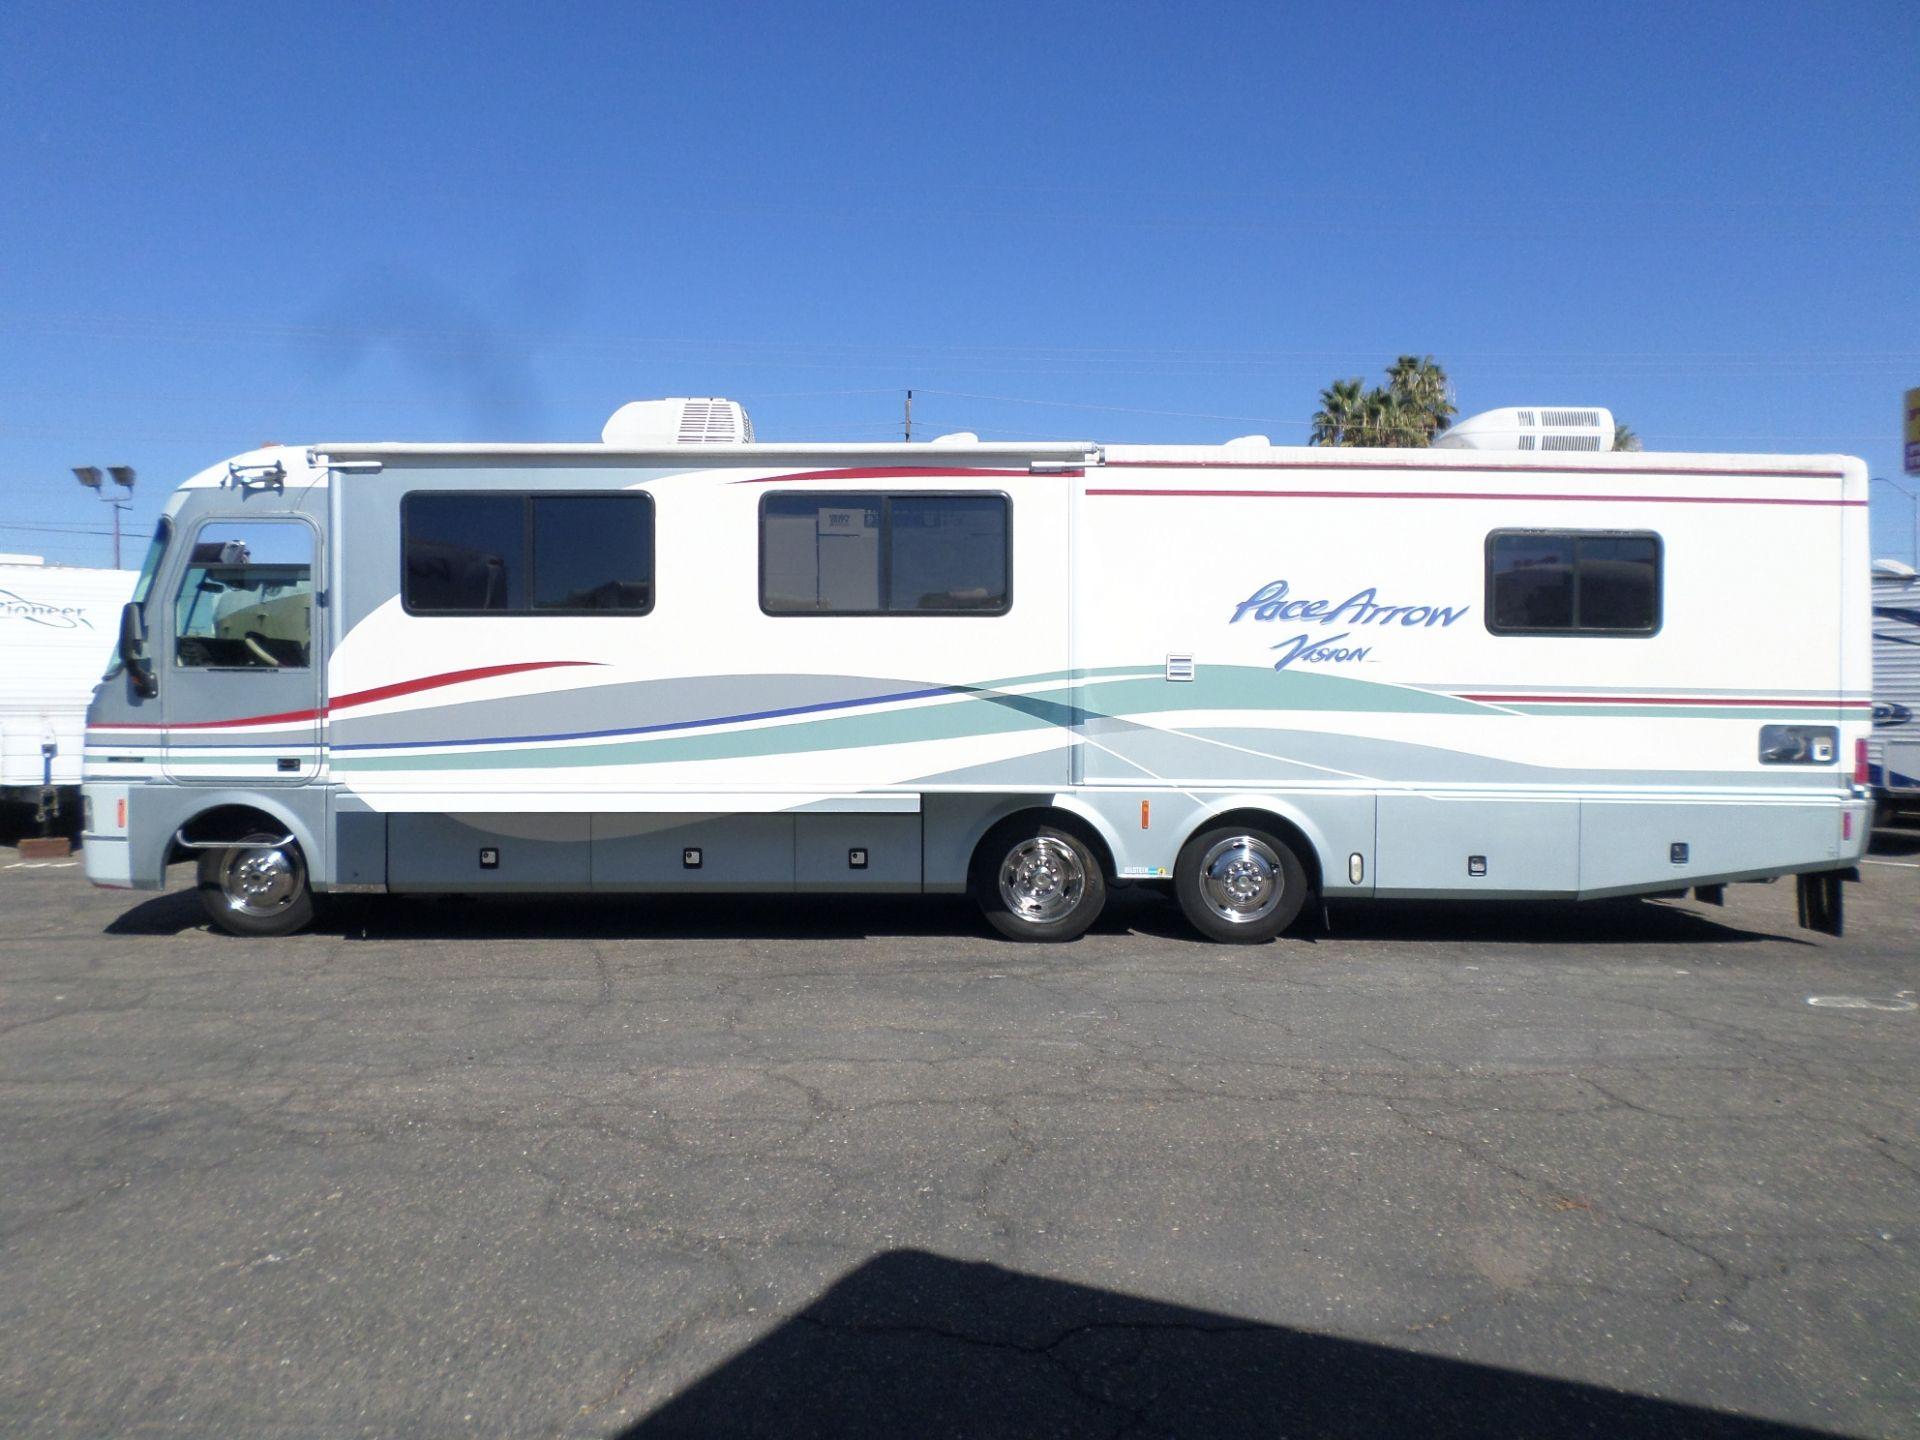 Rv For Sale 1998 Pace Arrow Vision 37 In Lodi Stockton Ca Rv For Sale Camping World Rv Sales Used Rvs For Sale